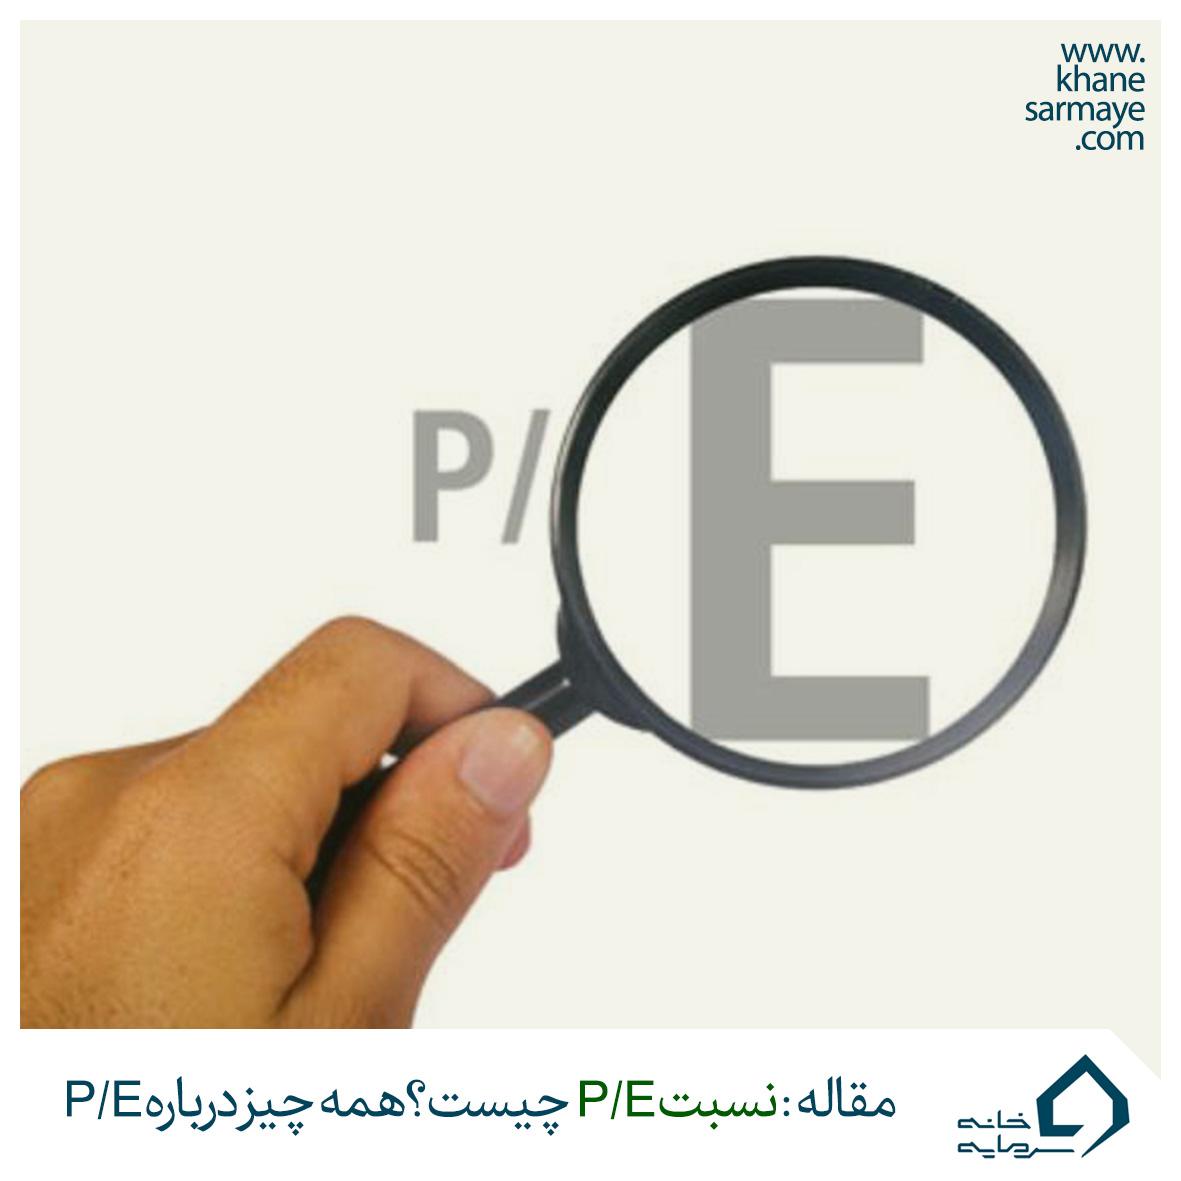 نسبت p/e